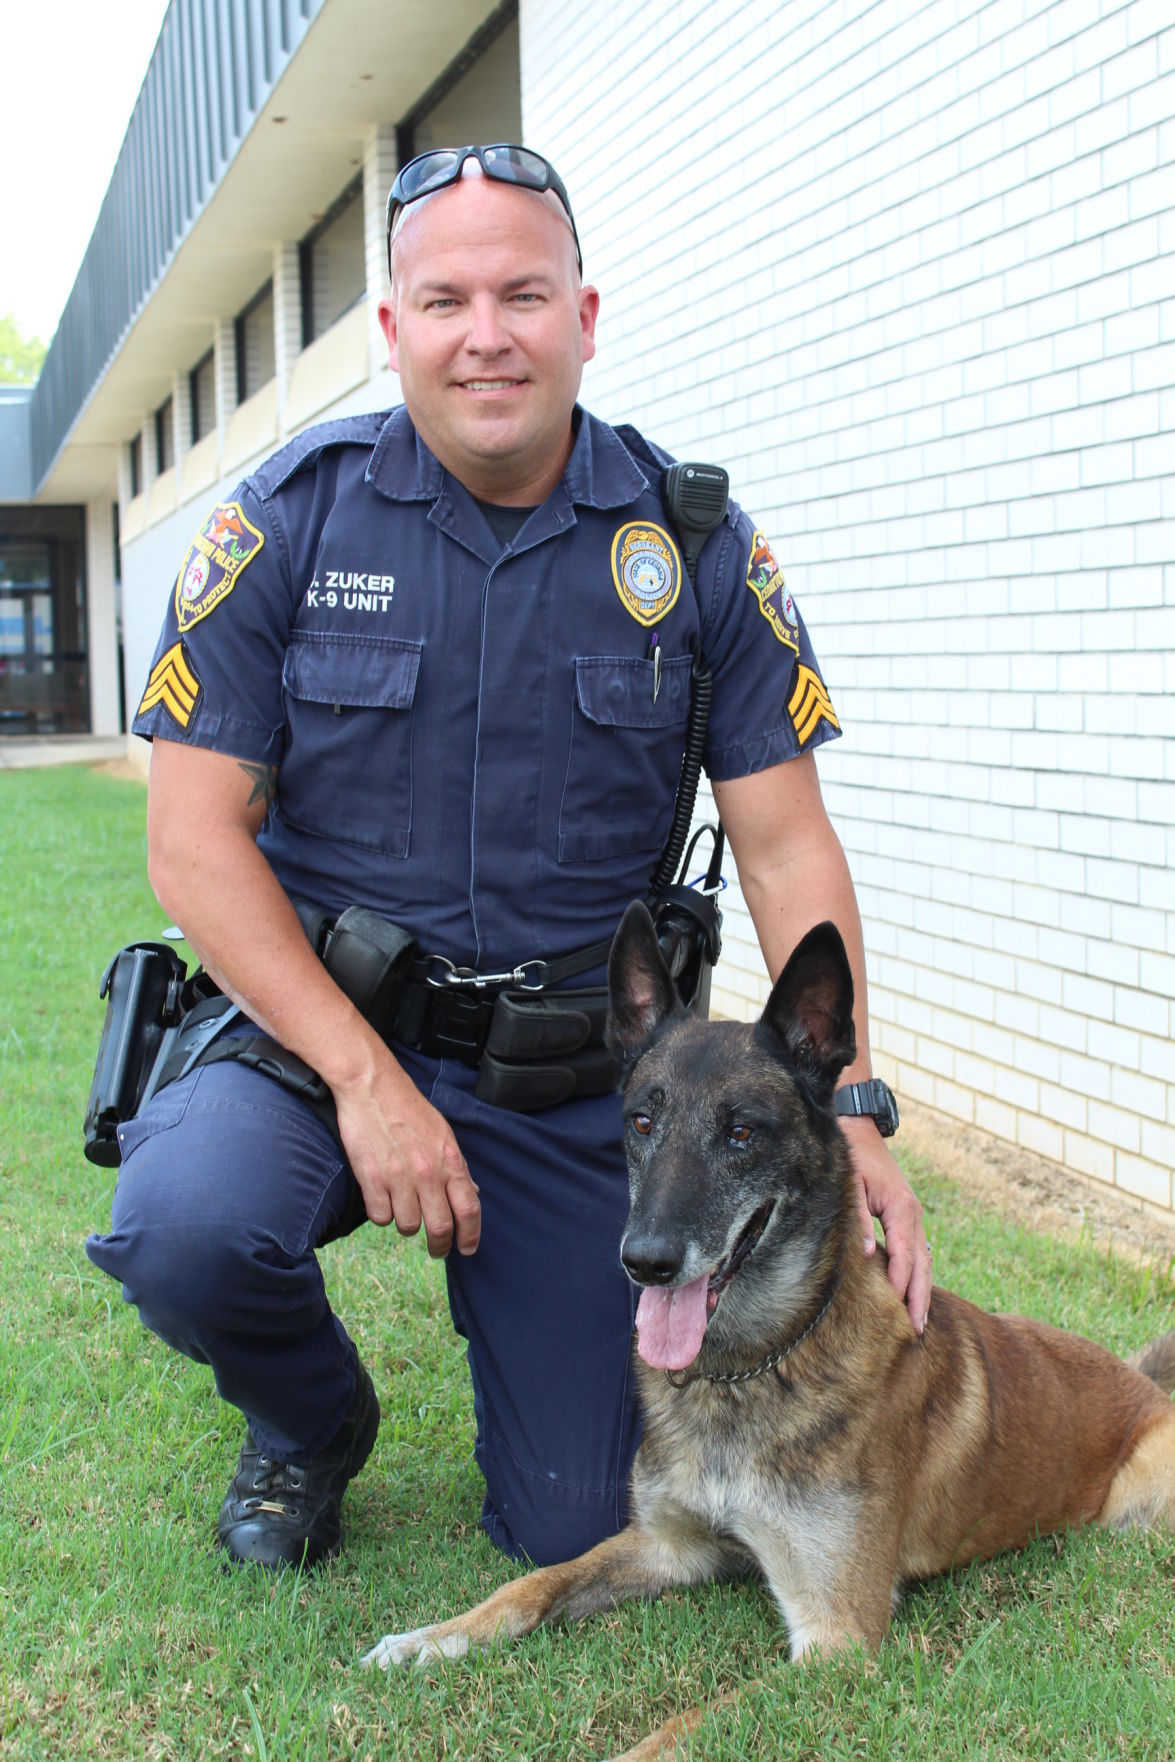 Sgt. Zuker and Kai